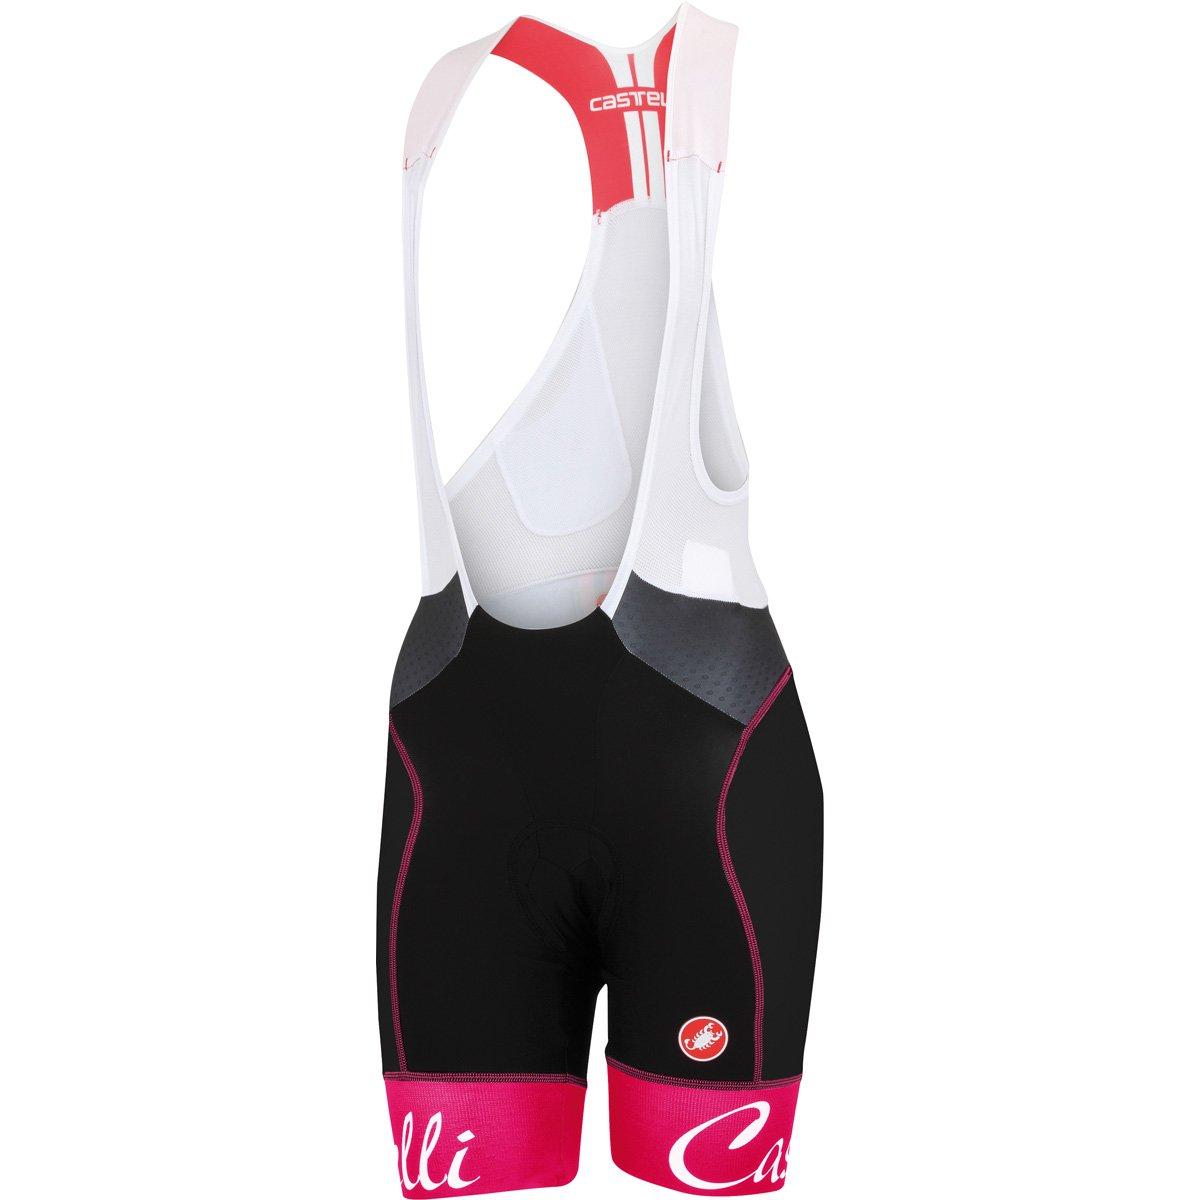 Castelli Free Aero Bib Shorts – Women 's B00U8CERR2 X-Small Black/Raspberry Black/Raspberry X-Small